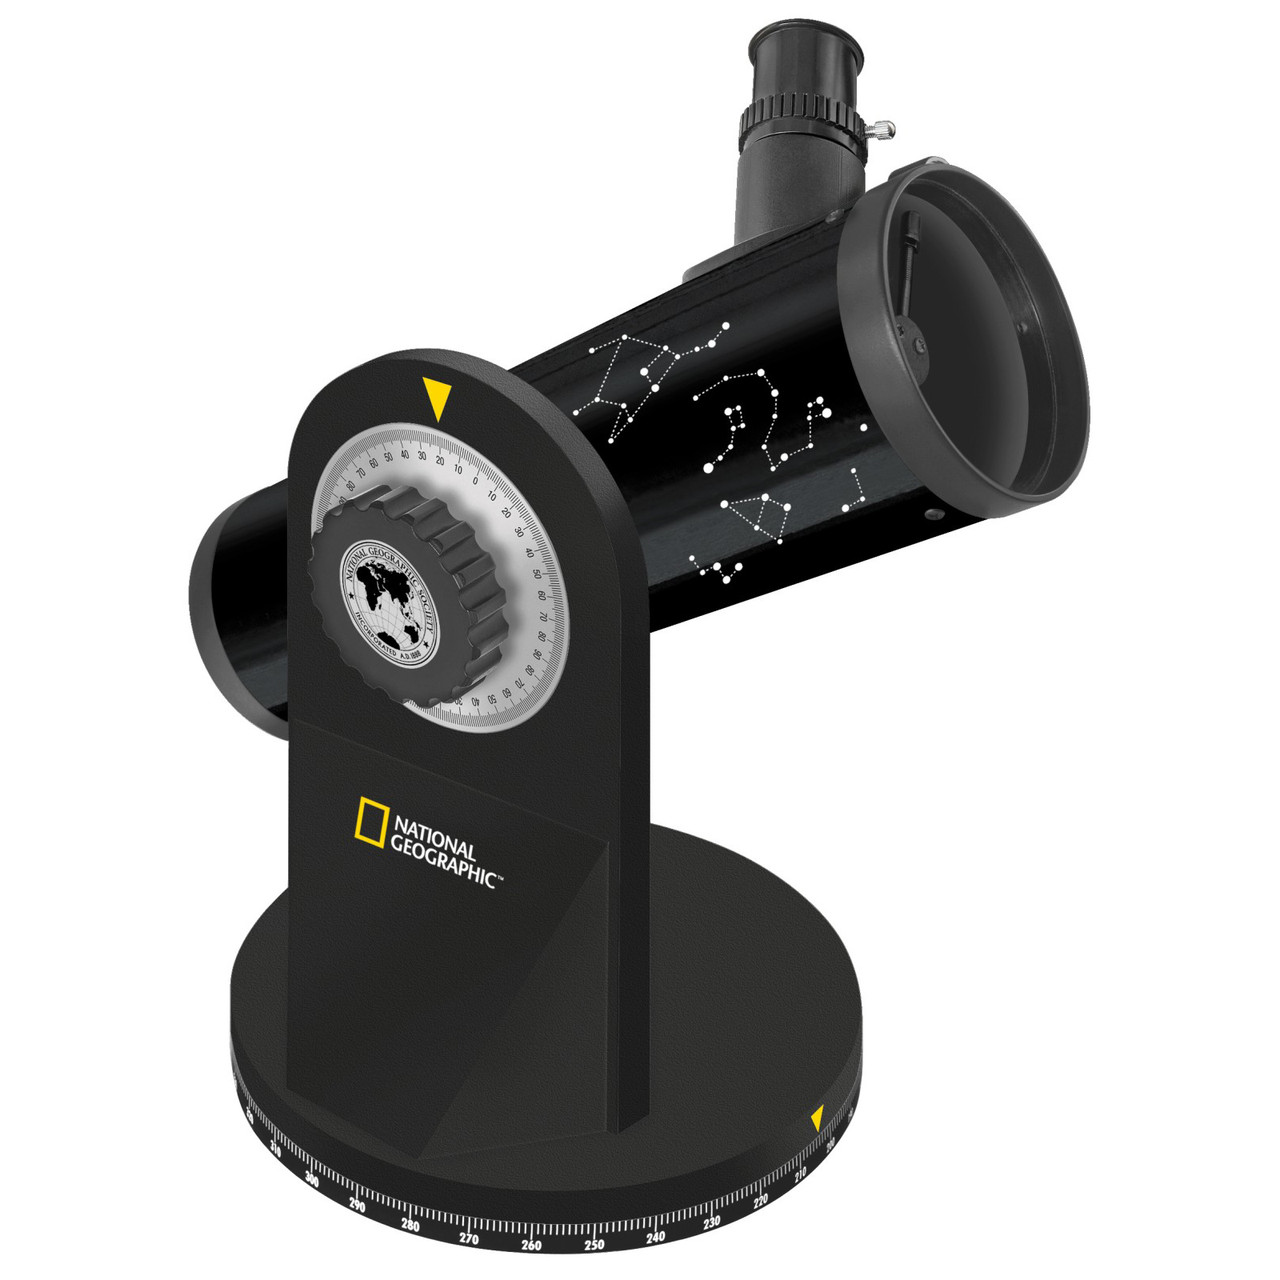 Телескоп National Geographic 76/350 Compact (9015000)